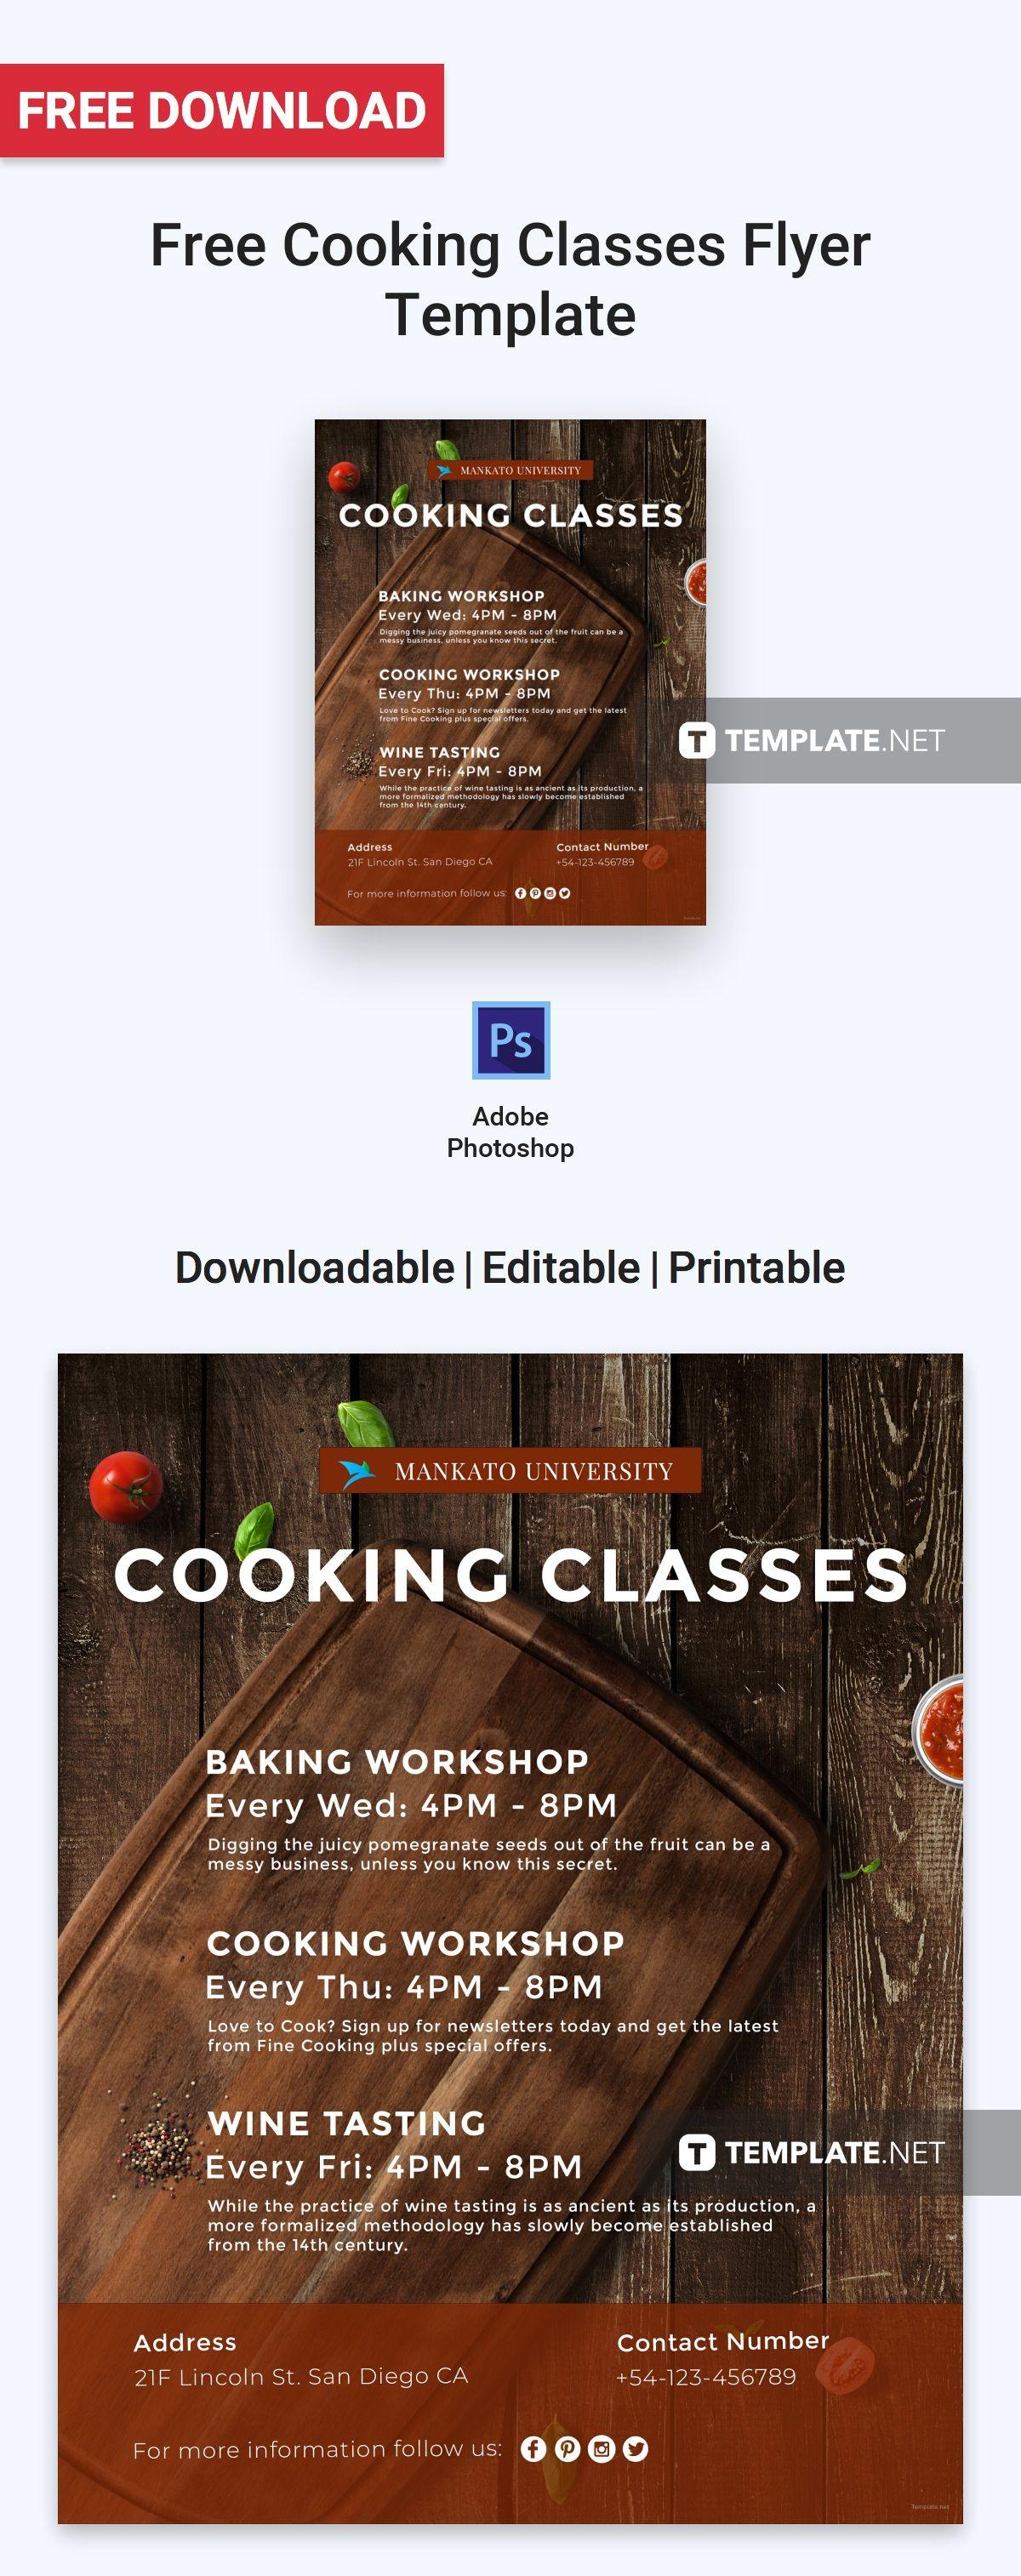 free cooking classes flyer flyer templates designs. Black Bedroom Furniture Sets. Home Design Ideas